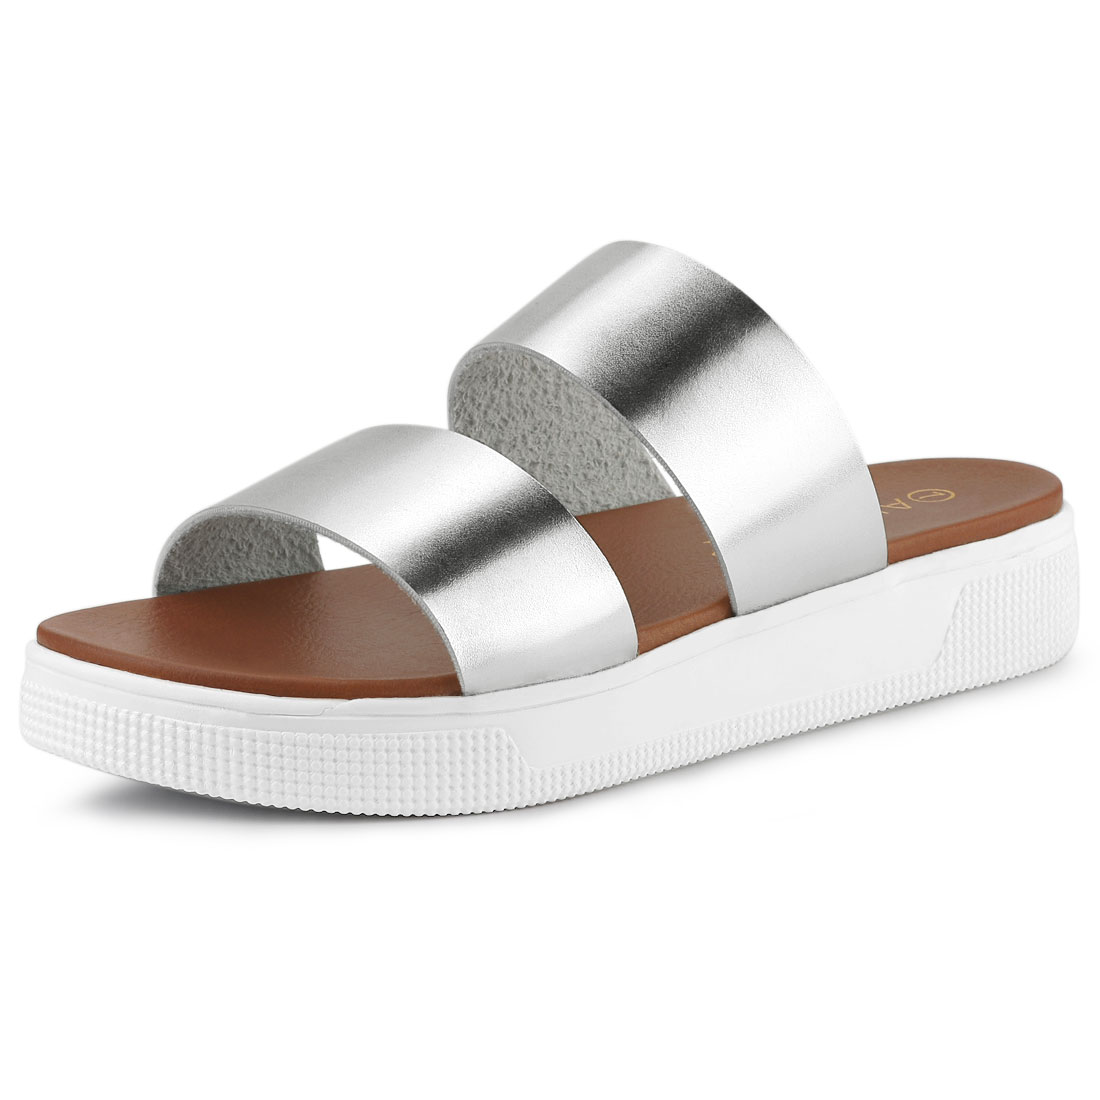 Allegra K Women's Open Toe Flatform Slides Sandals Silver US 7